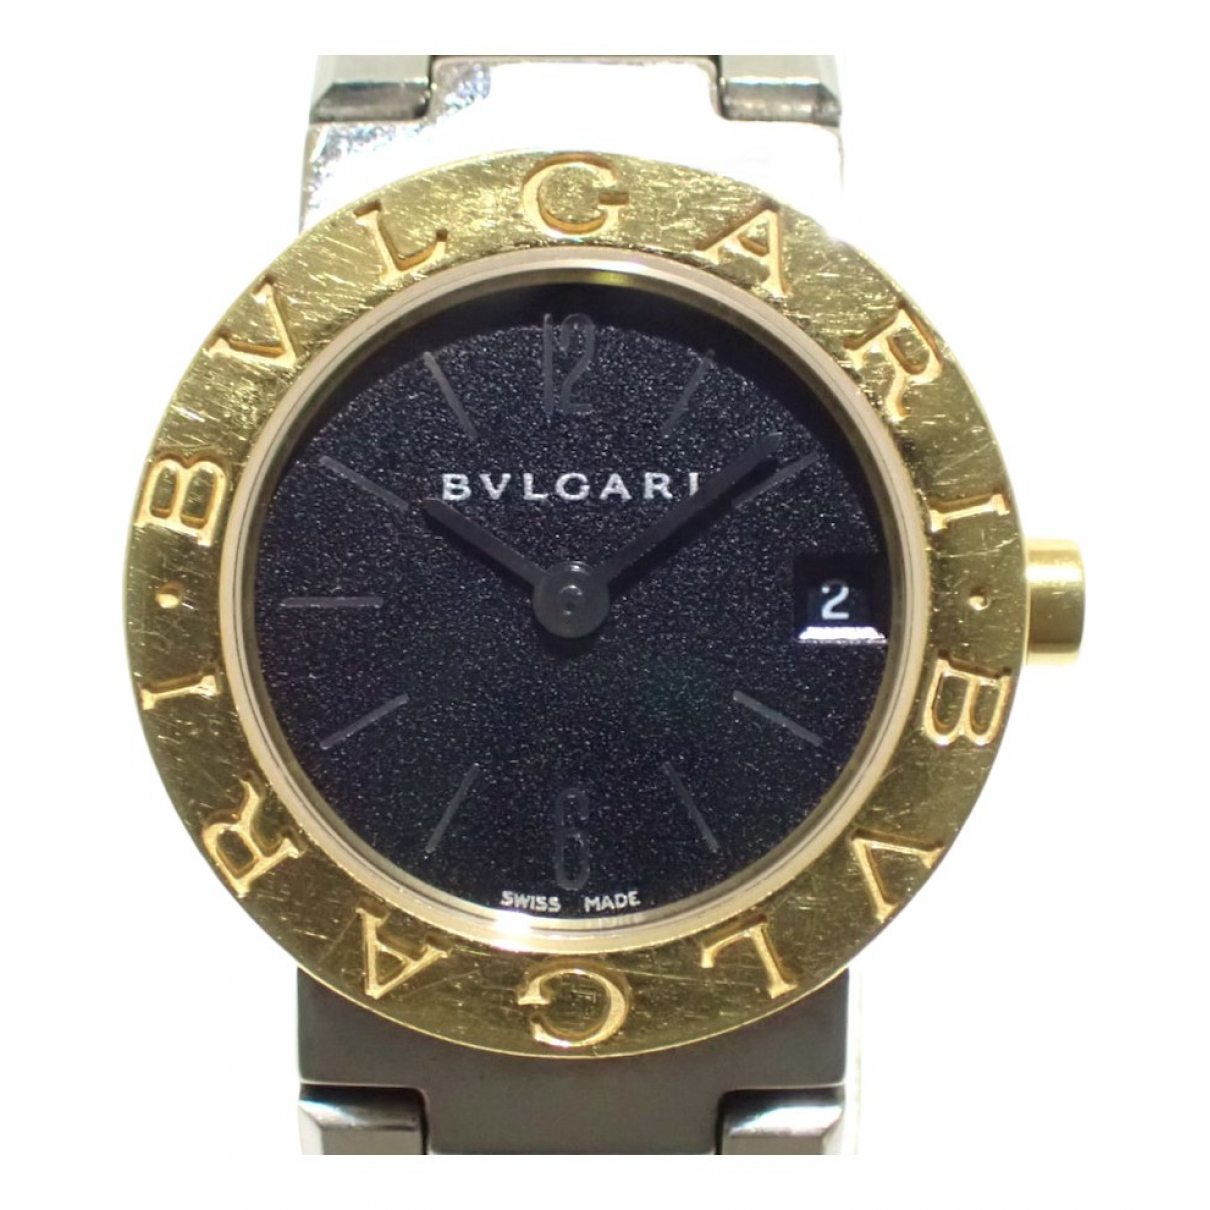 Bvlgari - Montre Bulgari Bulgari pour femme en or et acier - argente